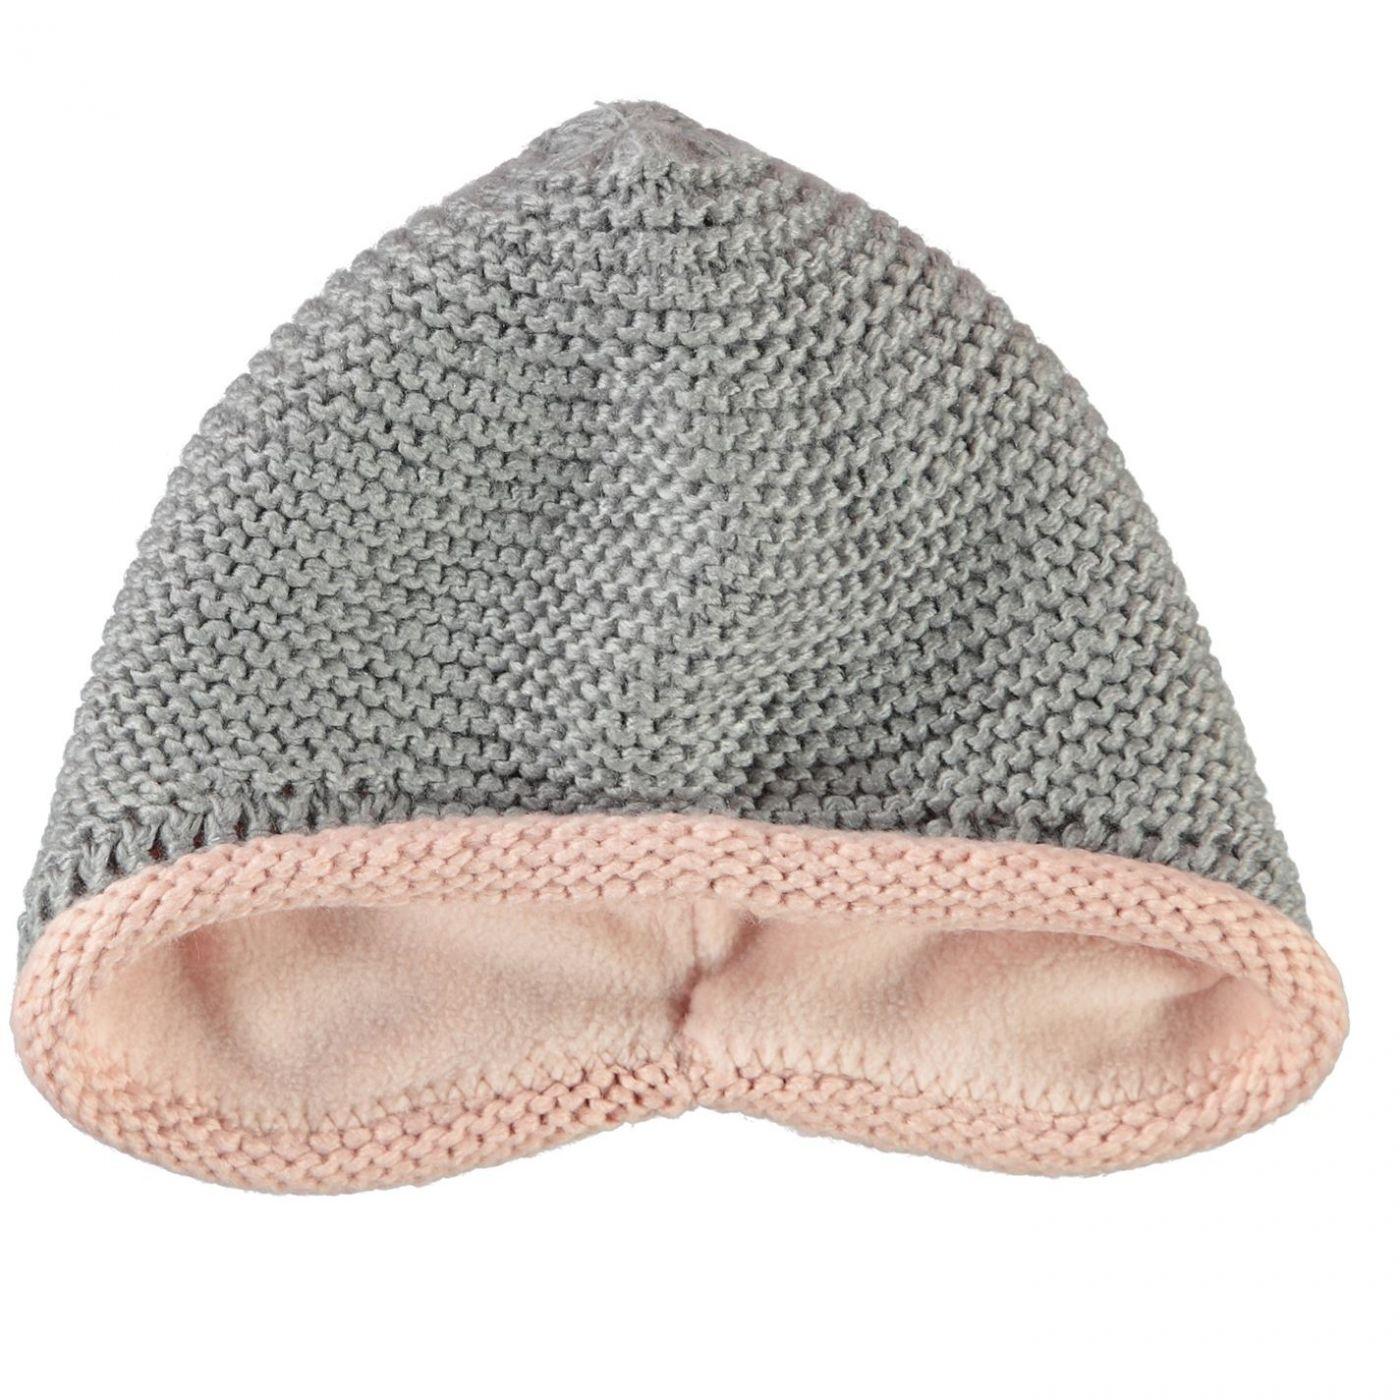 Adidas Knit Beanie Infants